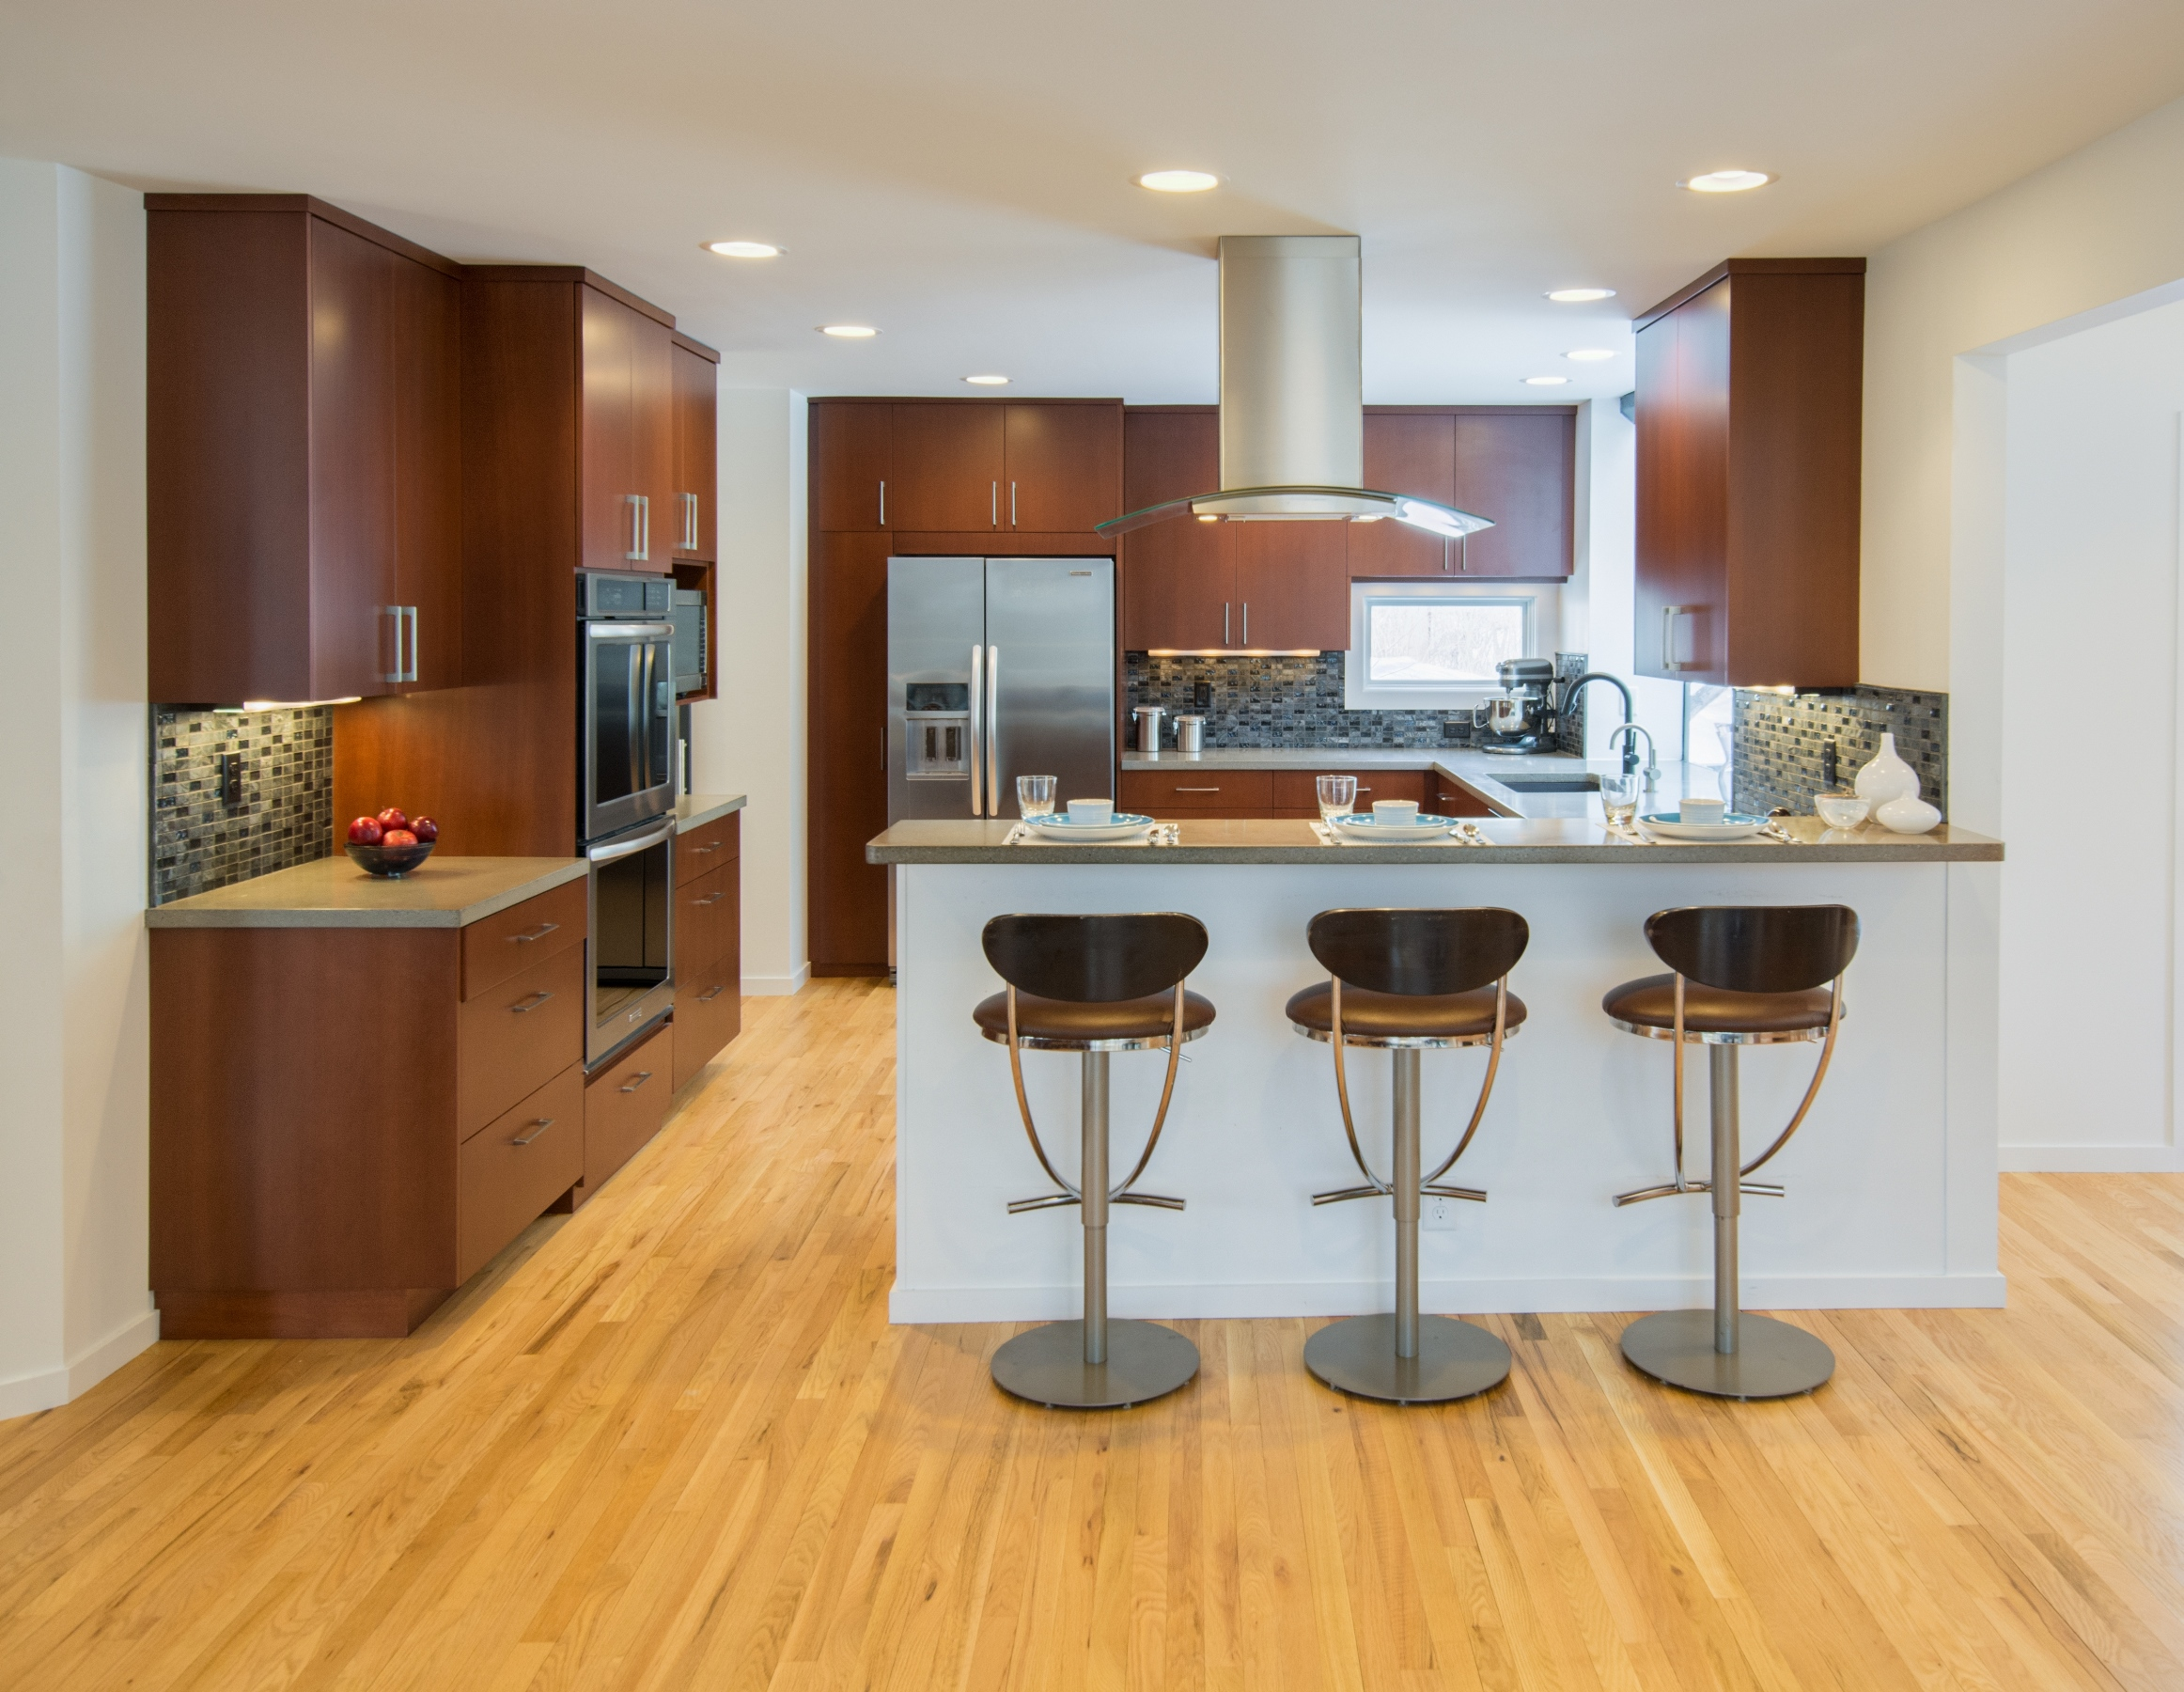 Kitchens_30.jpg